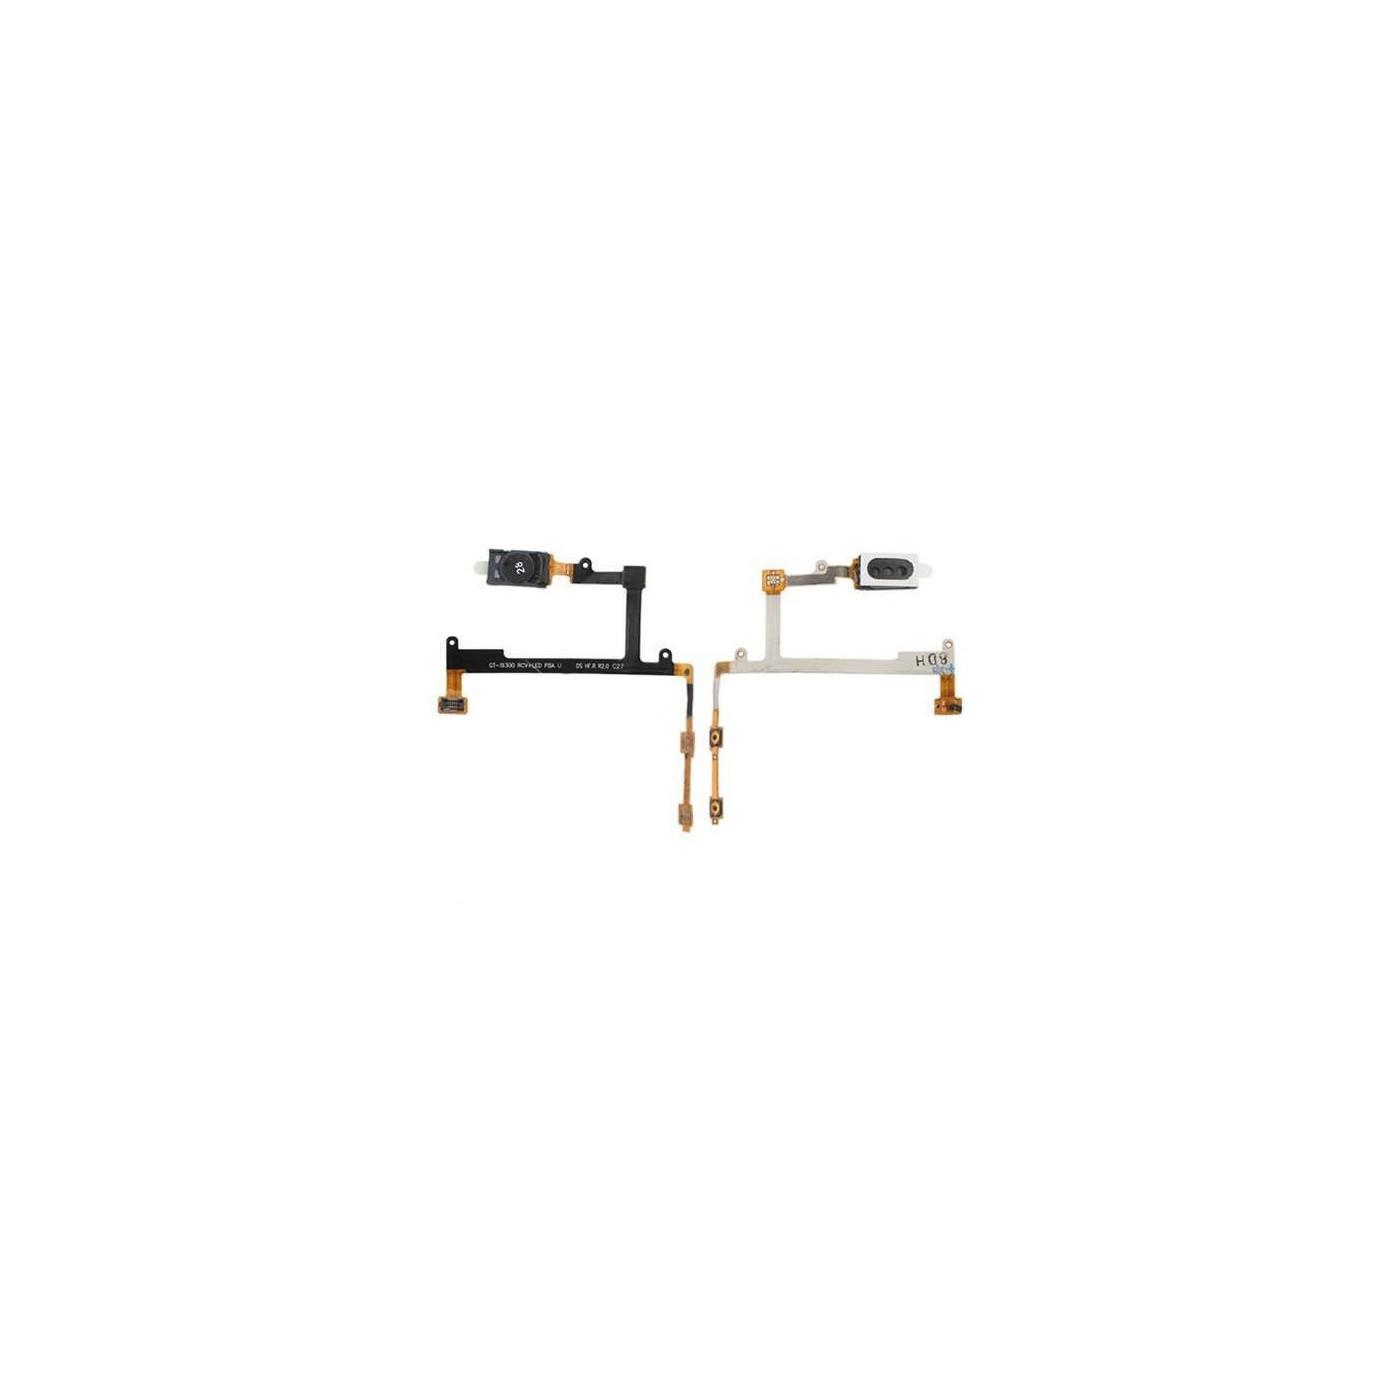 Flat flex speaker artoparlante pulsanti volume per samsung galaxy s3 i9300 i9305